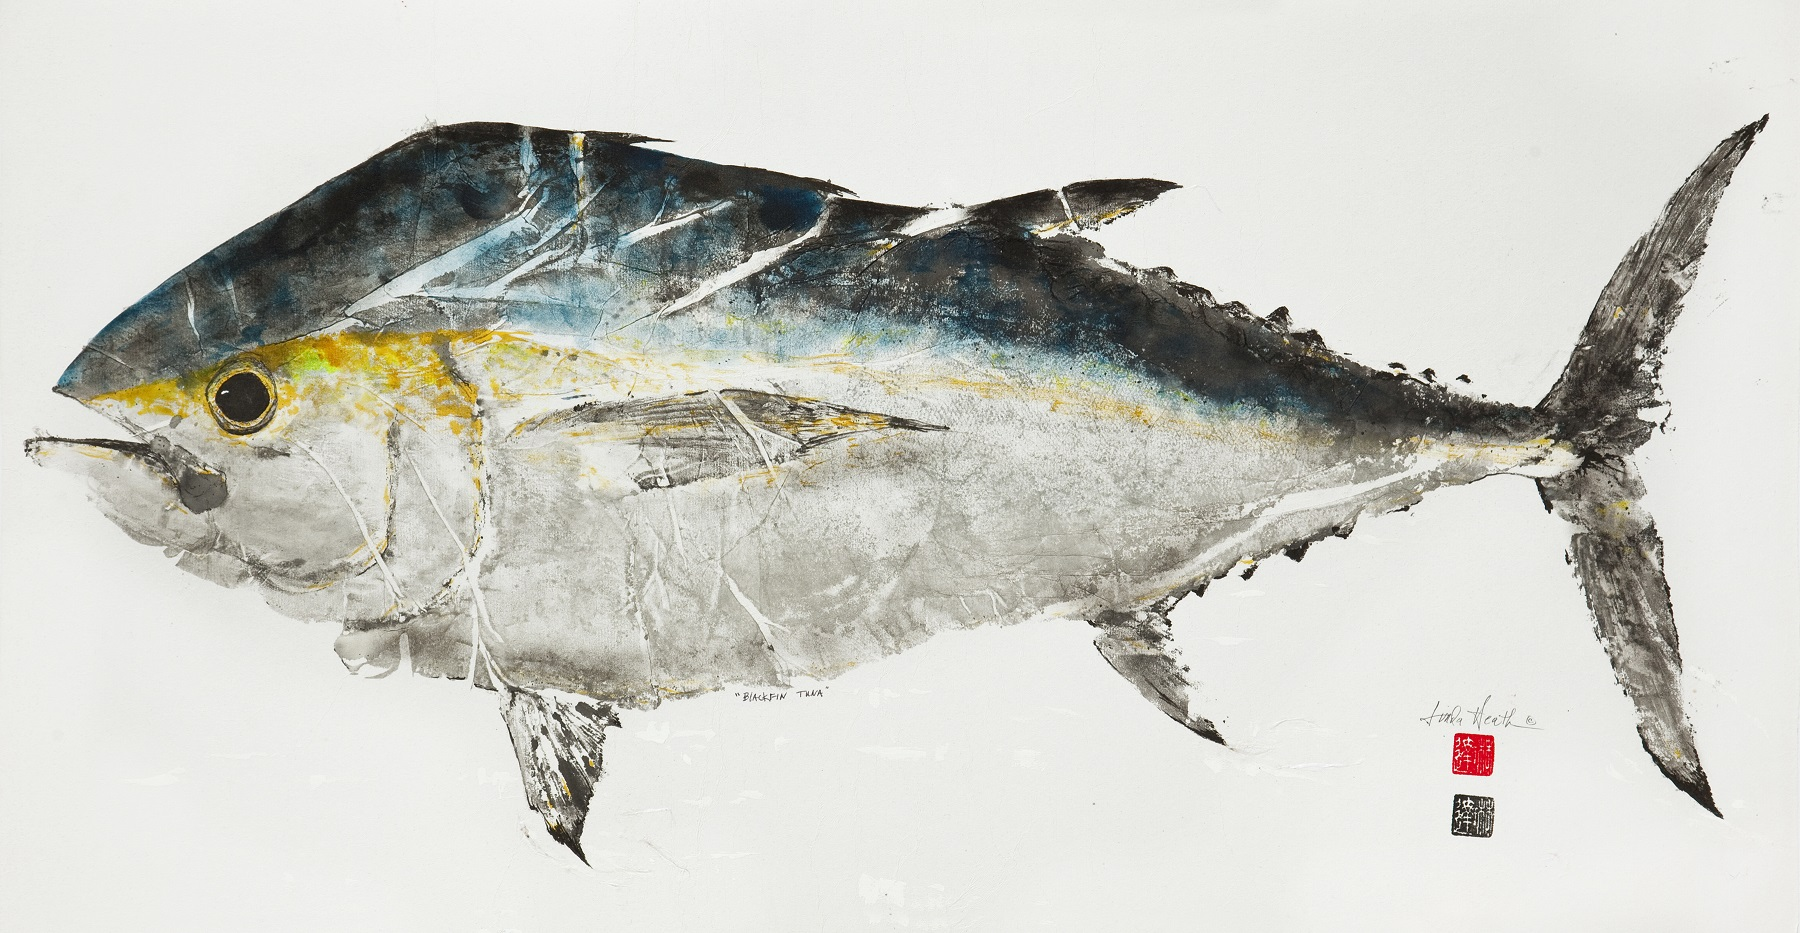 608-Black Fin Tuna